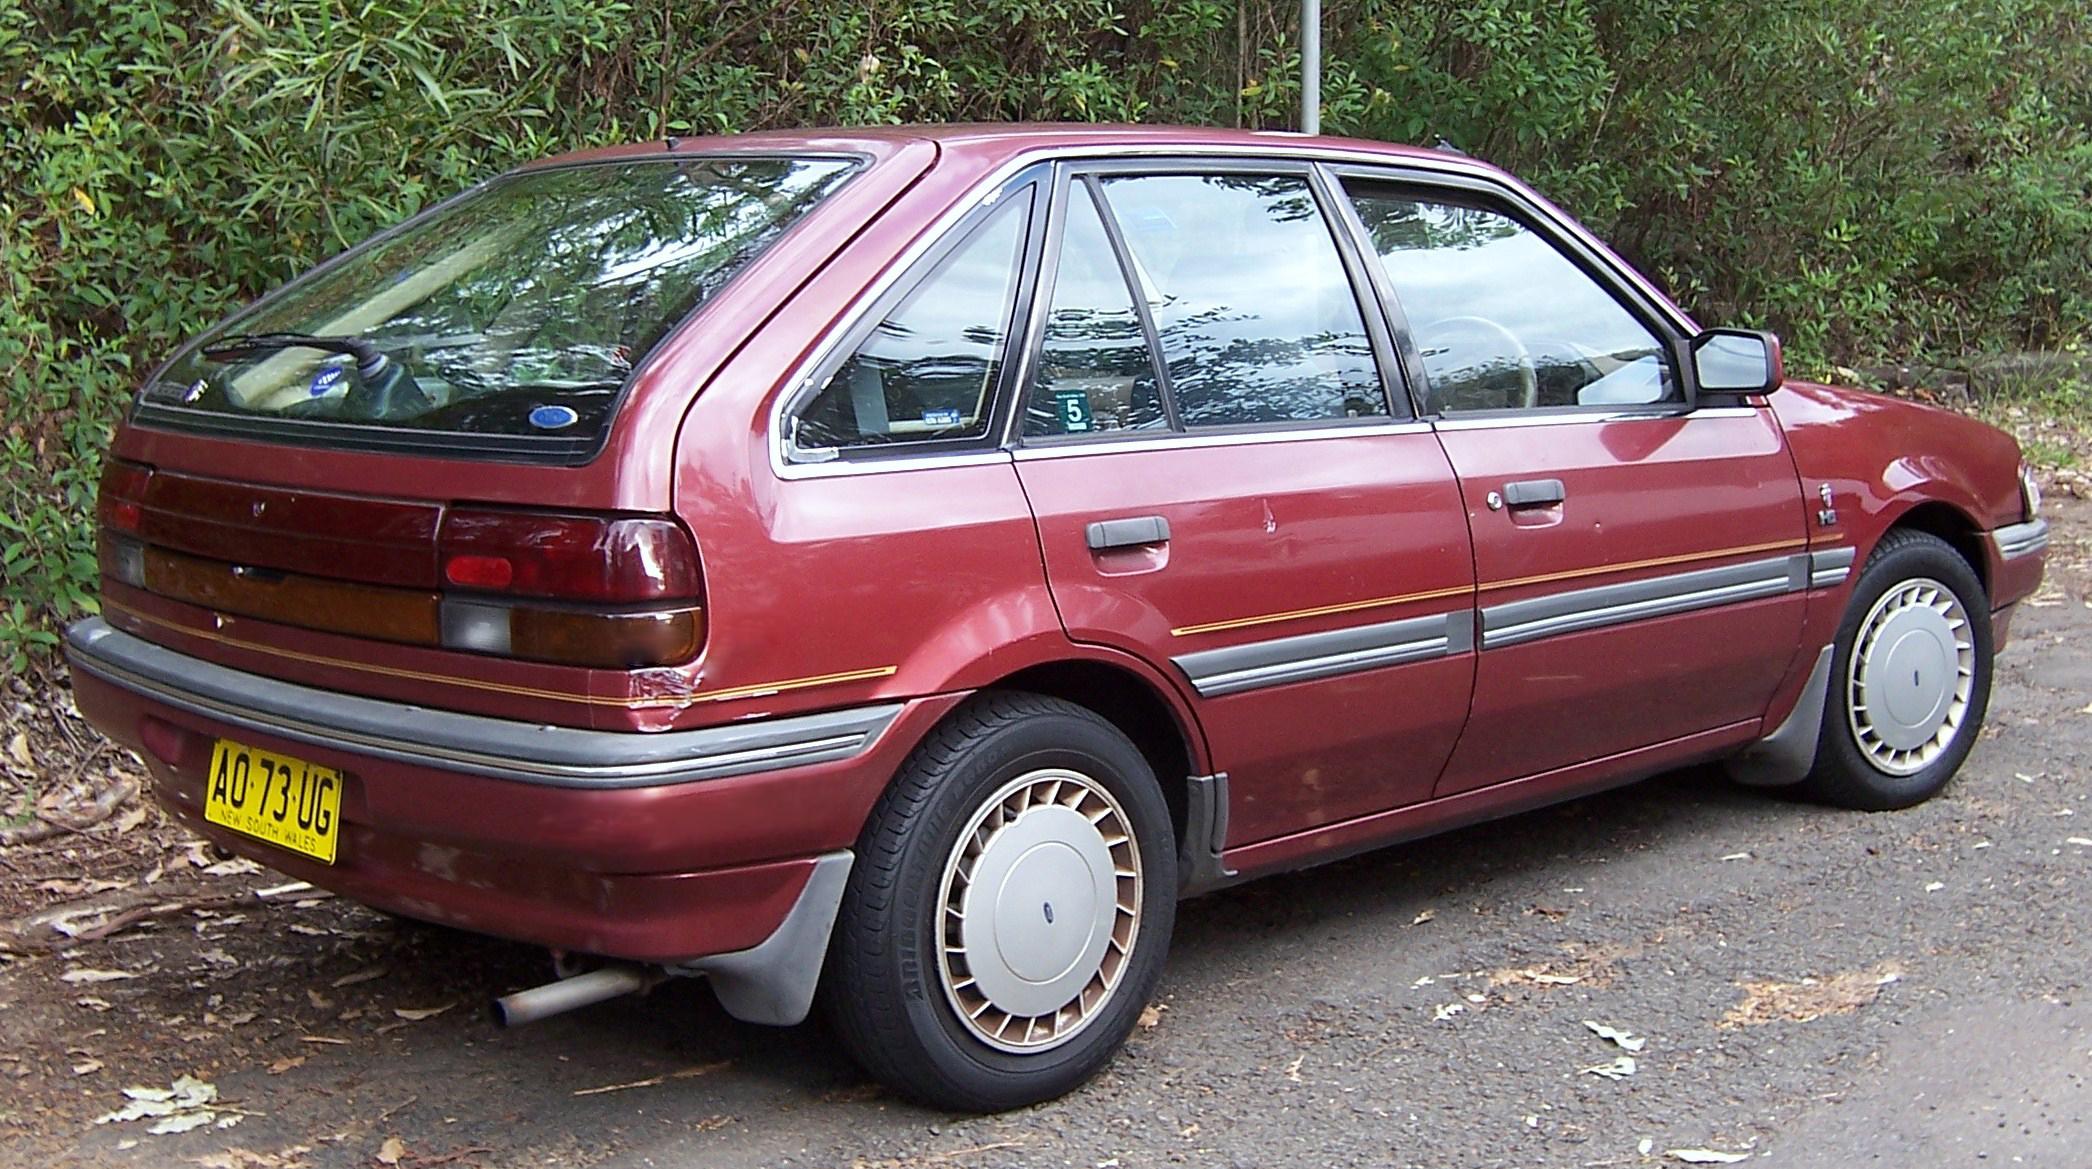 File:1987 1990_Ford_Laser_(KE)_Ghia_5 Door_hatchback_02on 1989 Toyota Corolla